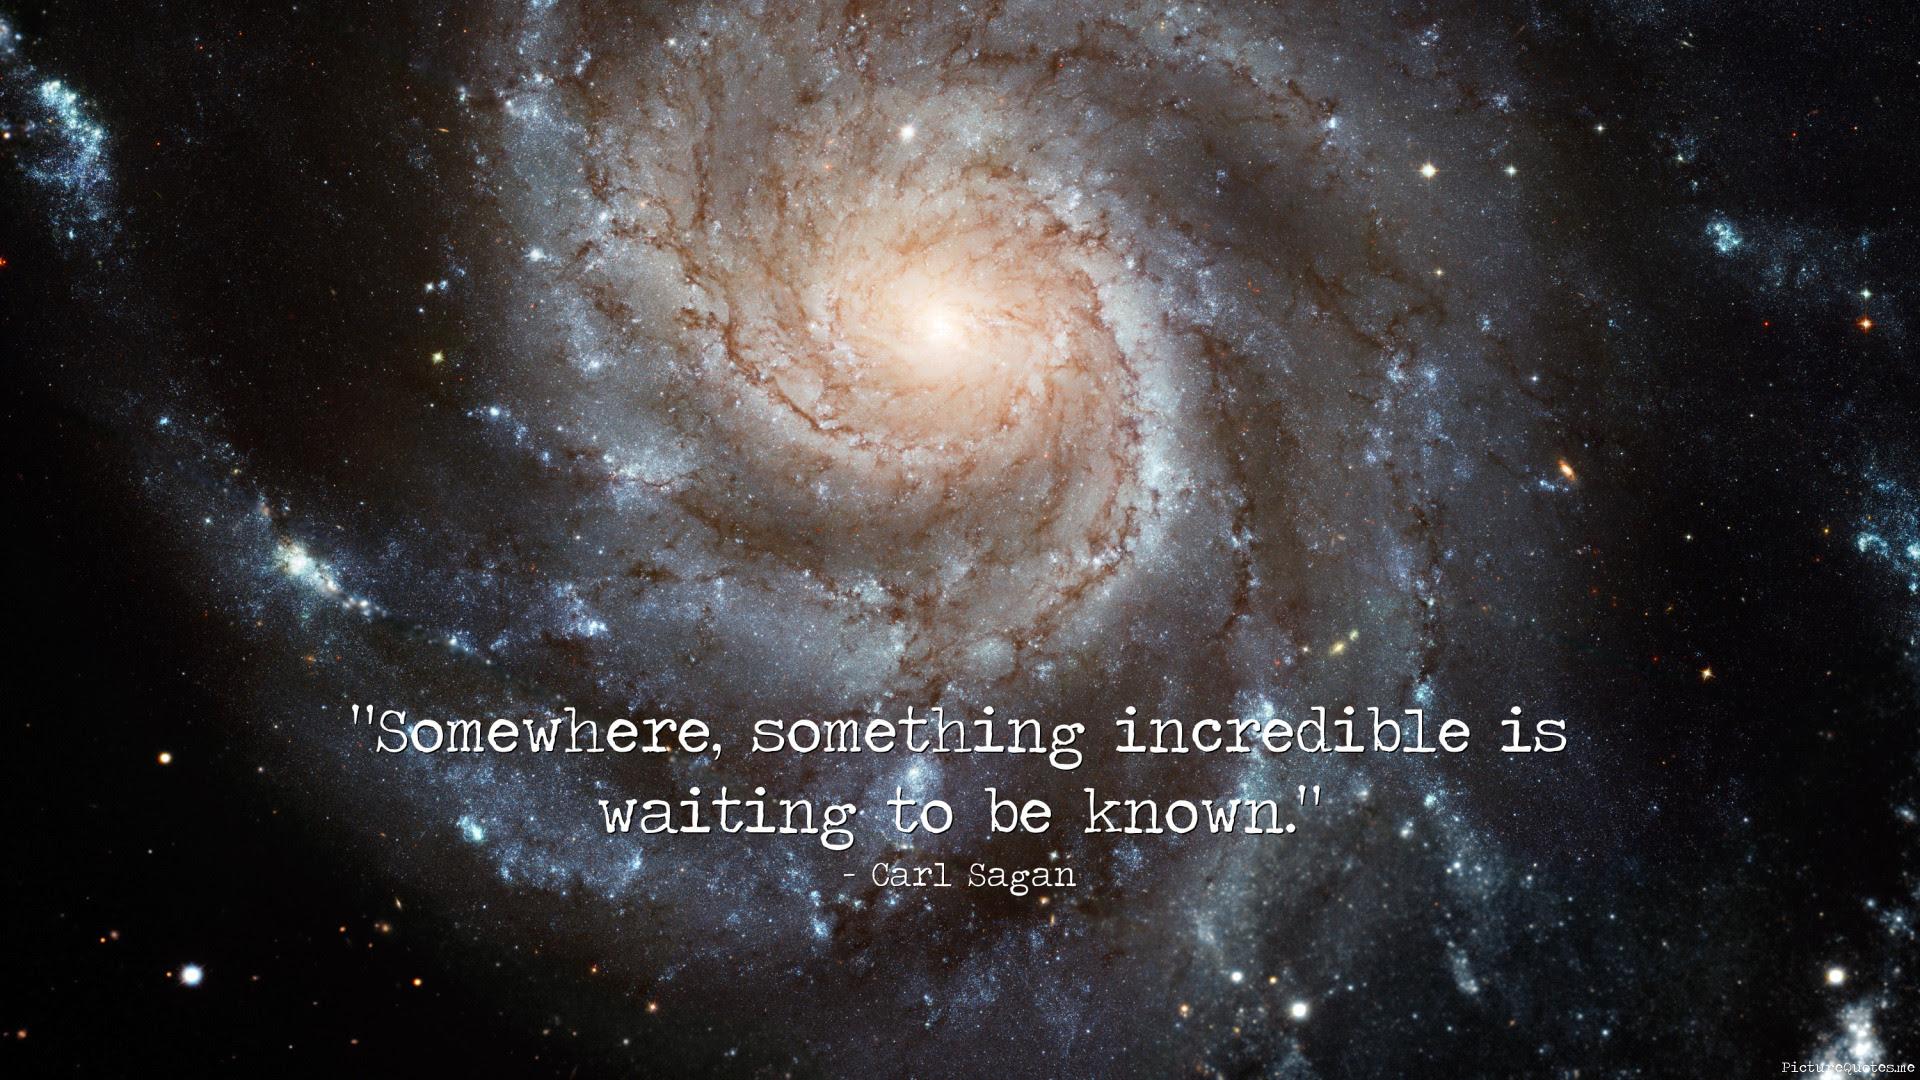 Carl Sagan Wallpaper (64+ images)